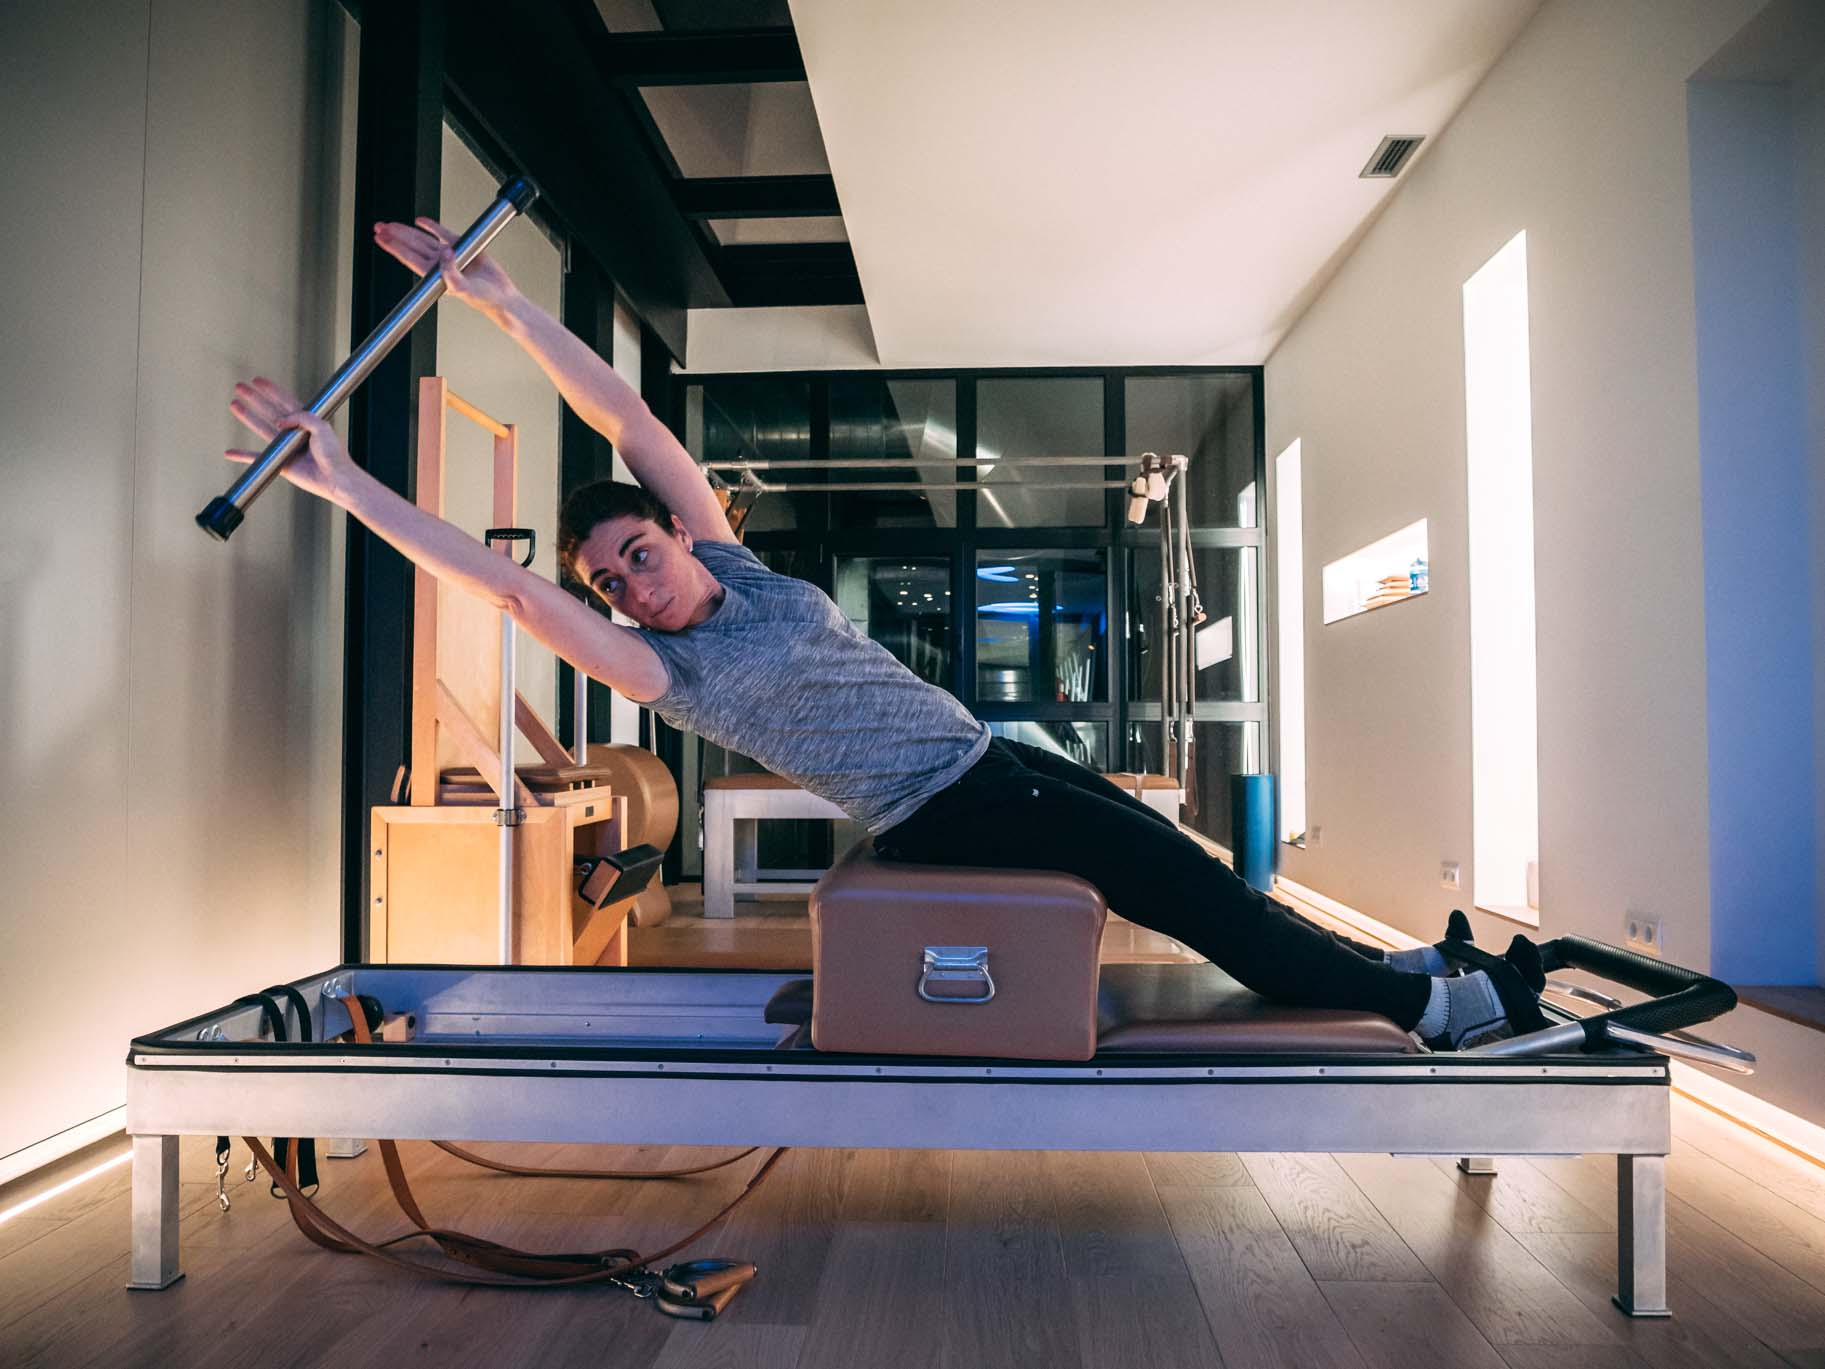 Pilates Reformer - Neus en Aqua Vilanova